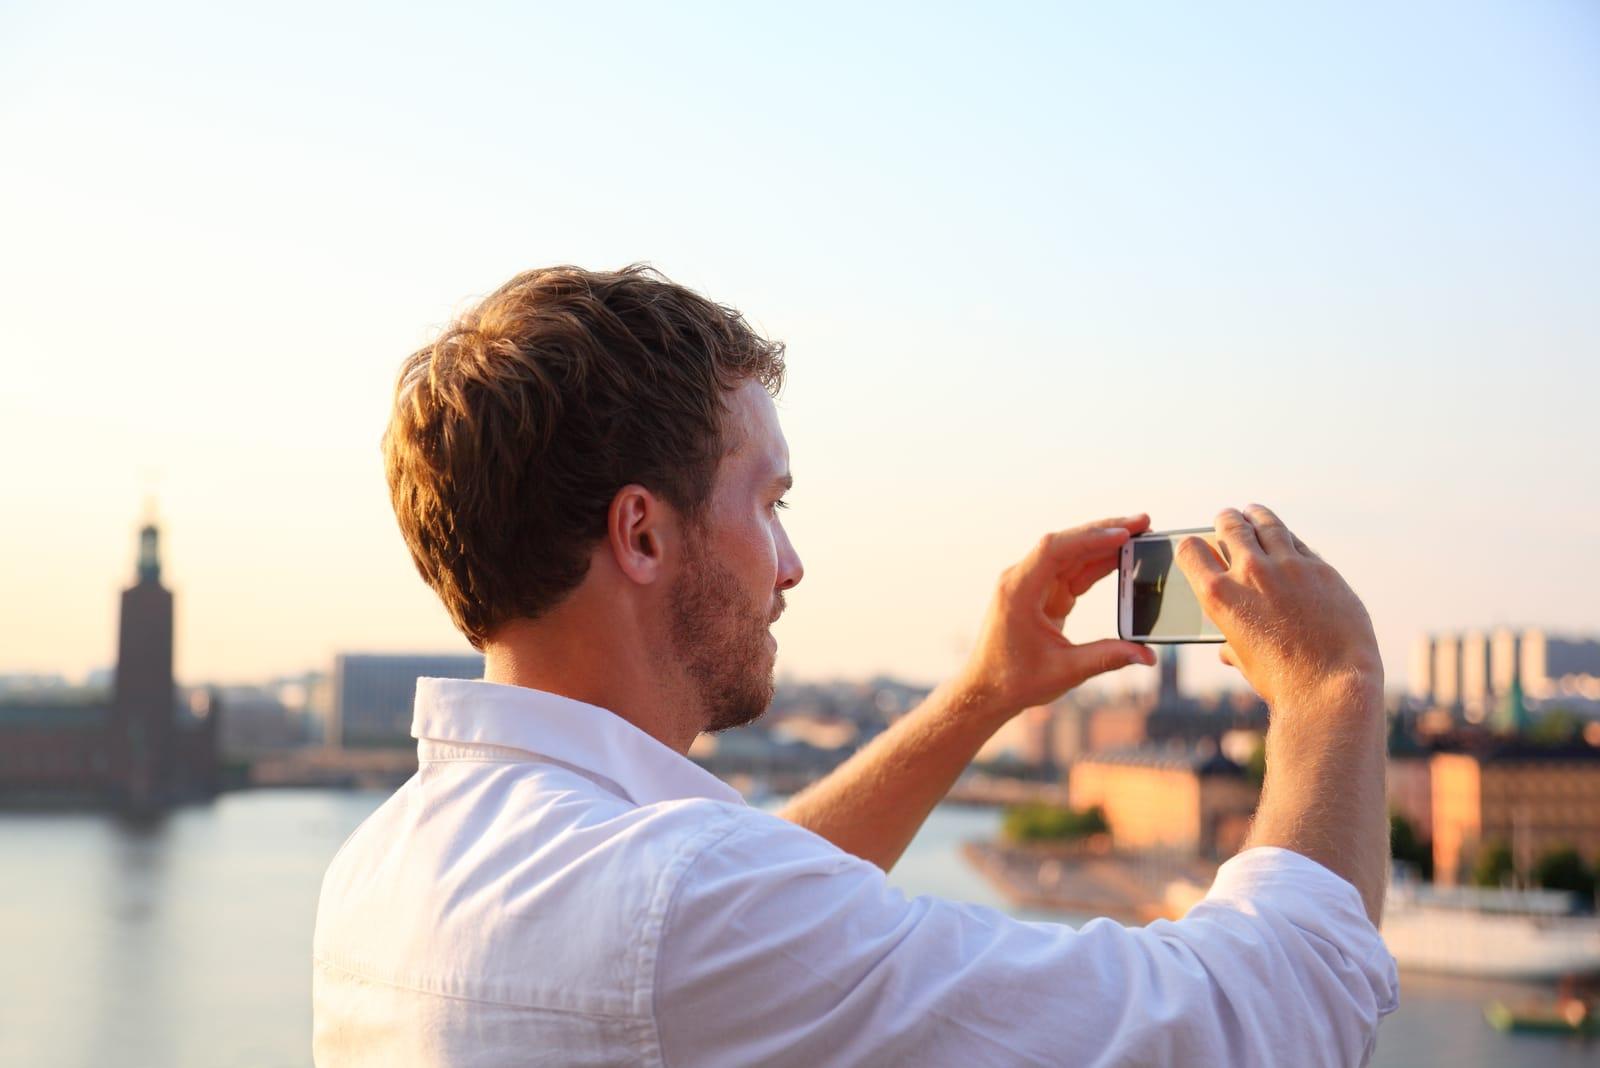 man taking photograph of sunset